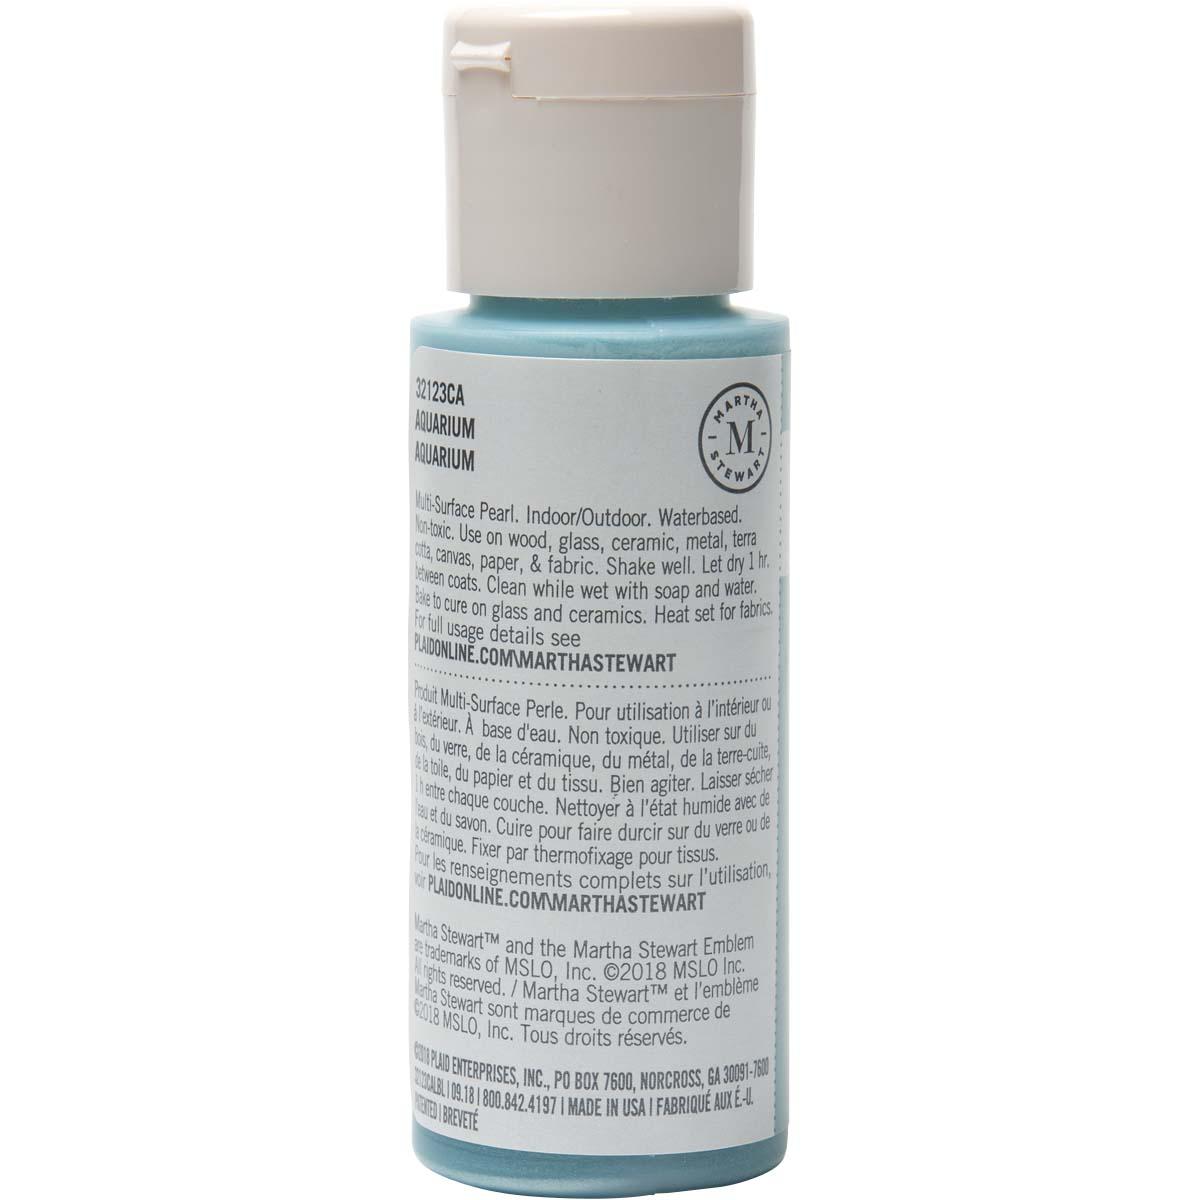 Martha Stewart ® Multi-Surface Pearl Acrylic Craft Paint - Aquarium, 2 oz. - 32123CA